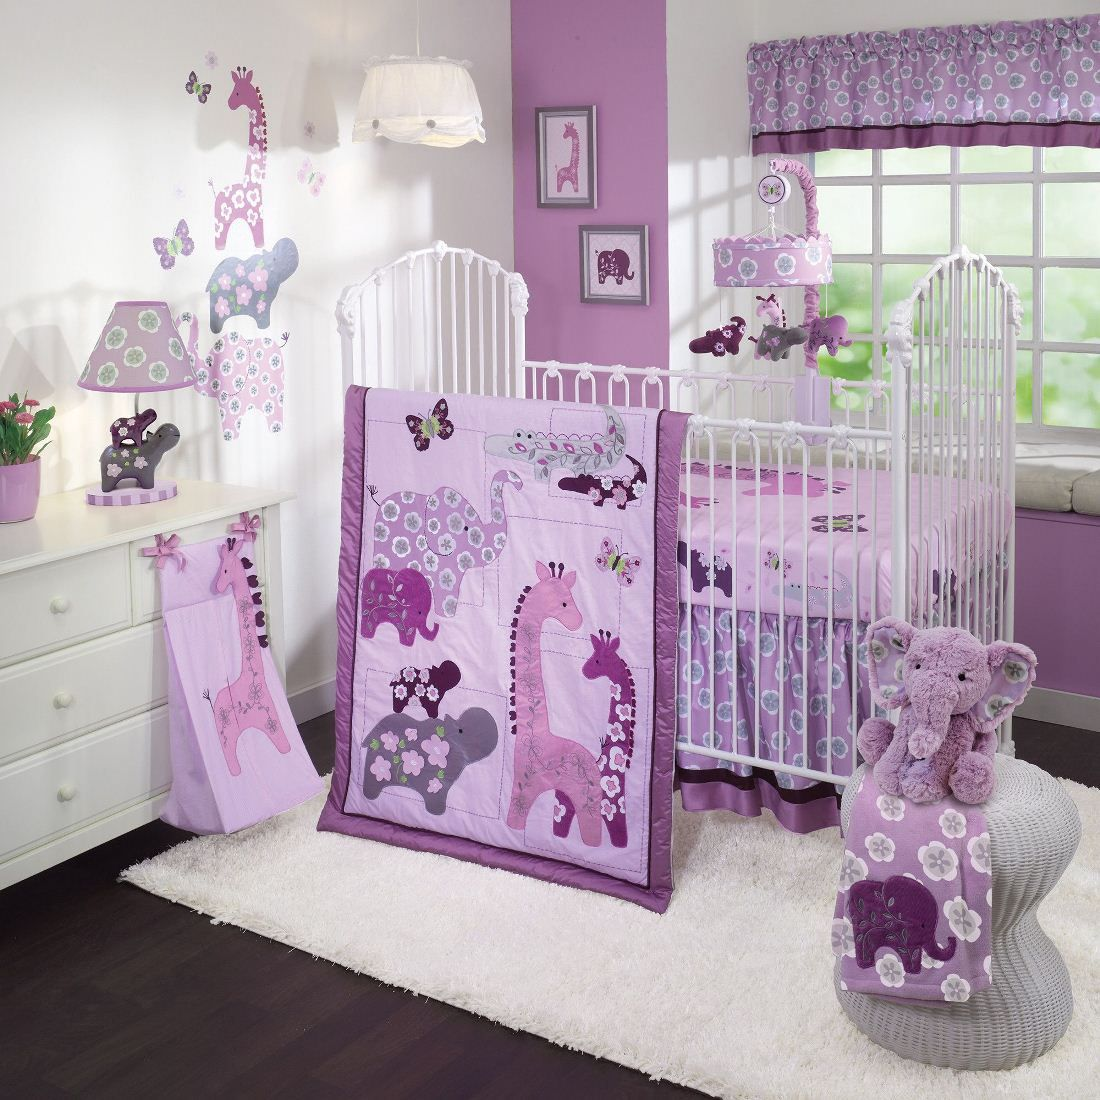 Image result for purple nursery decor